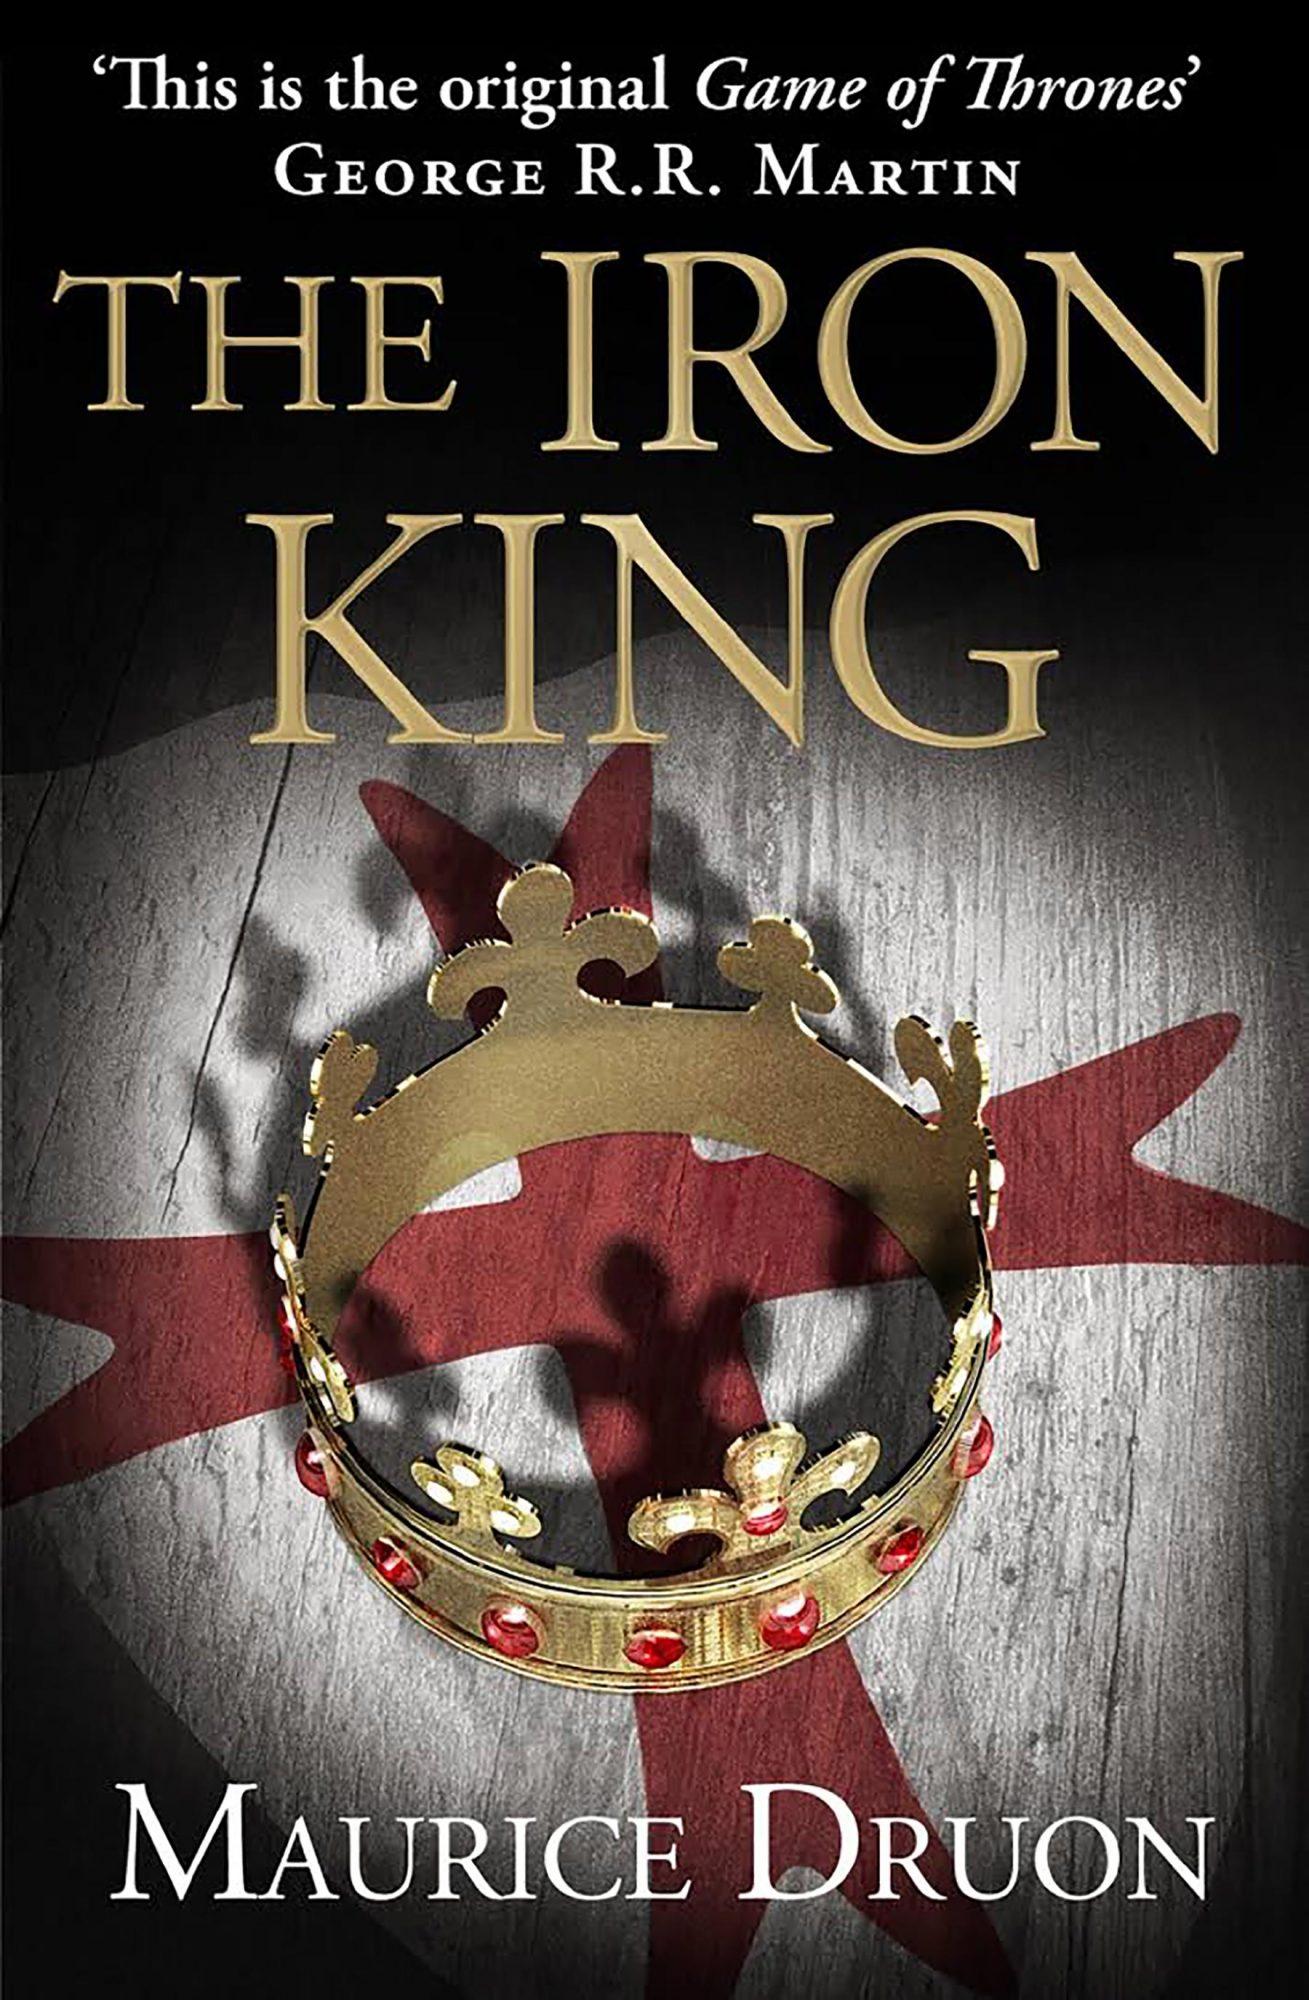 Maurice Druon, The Iron King